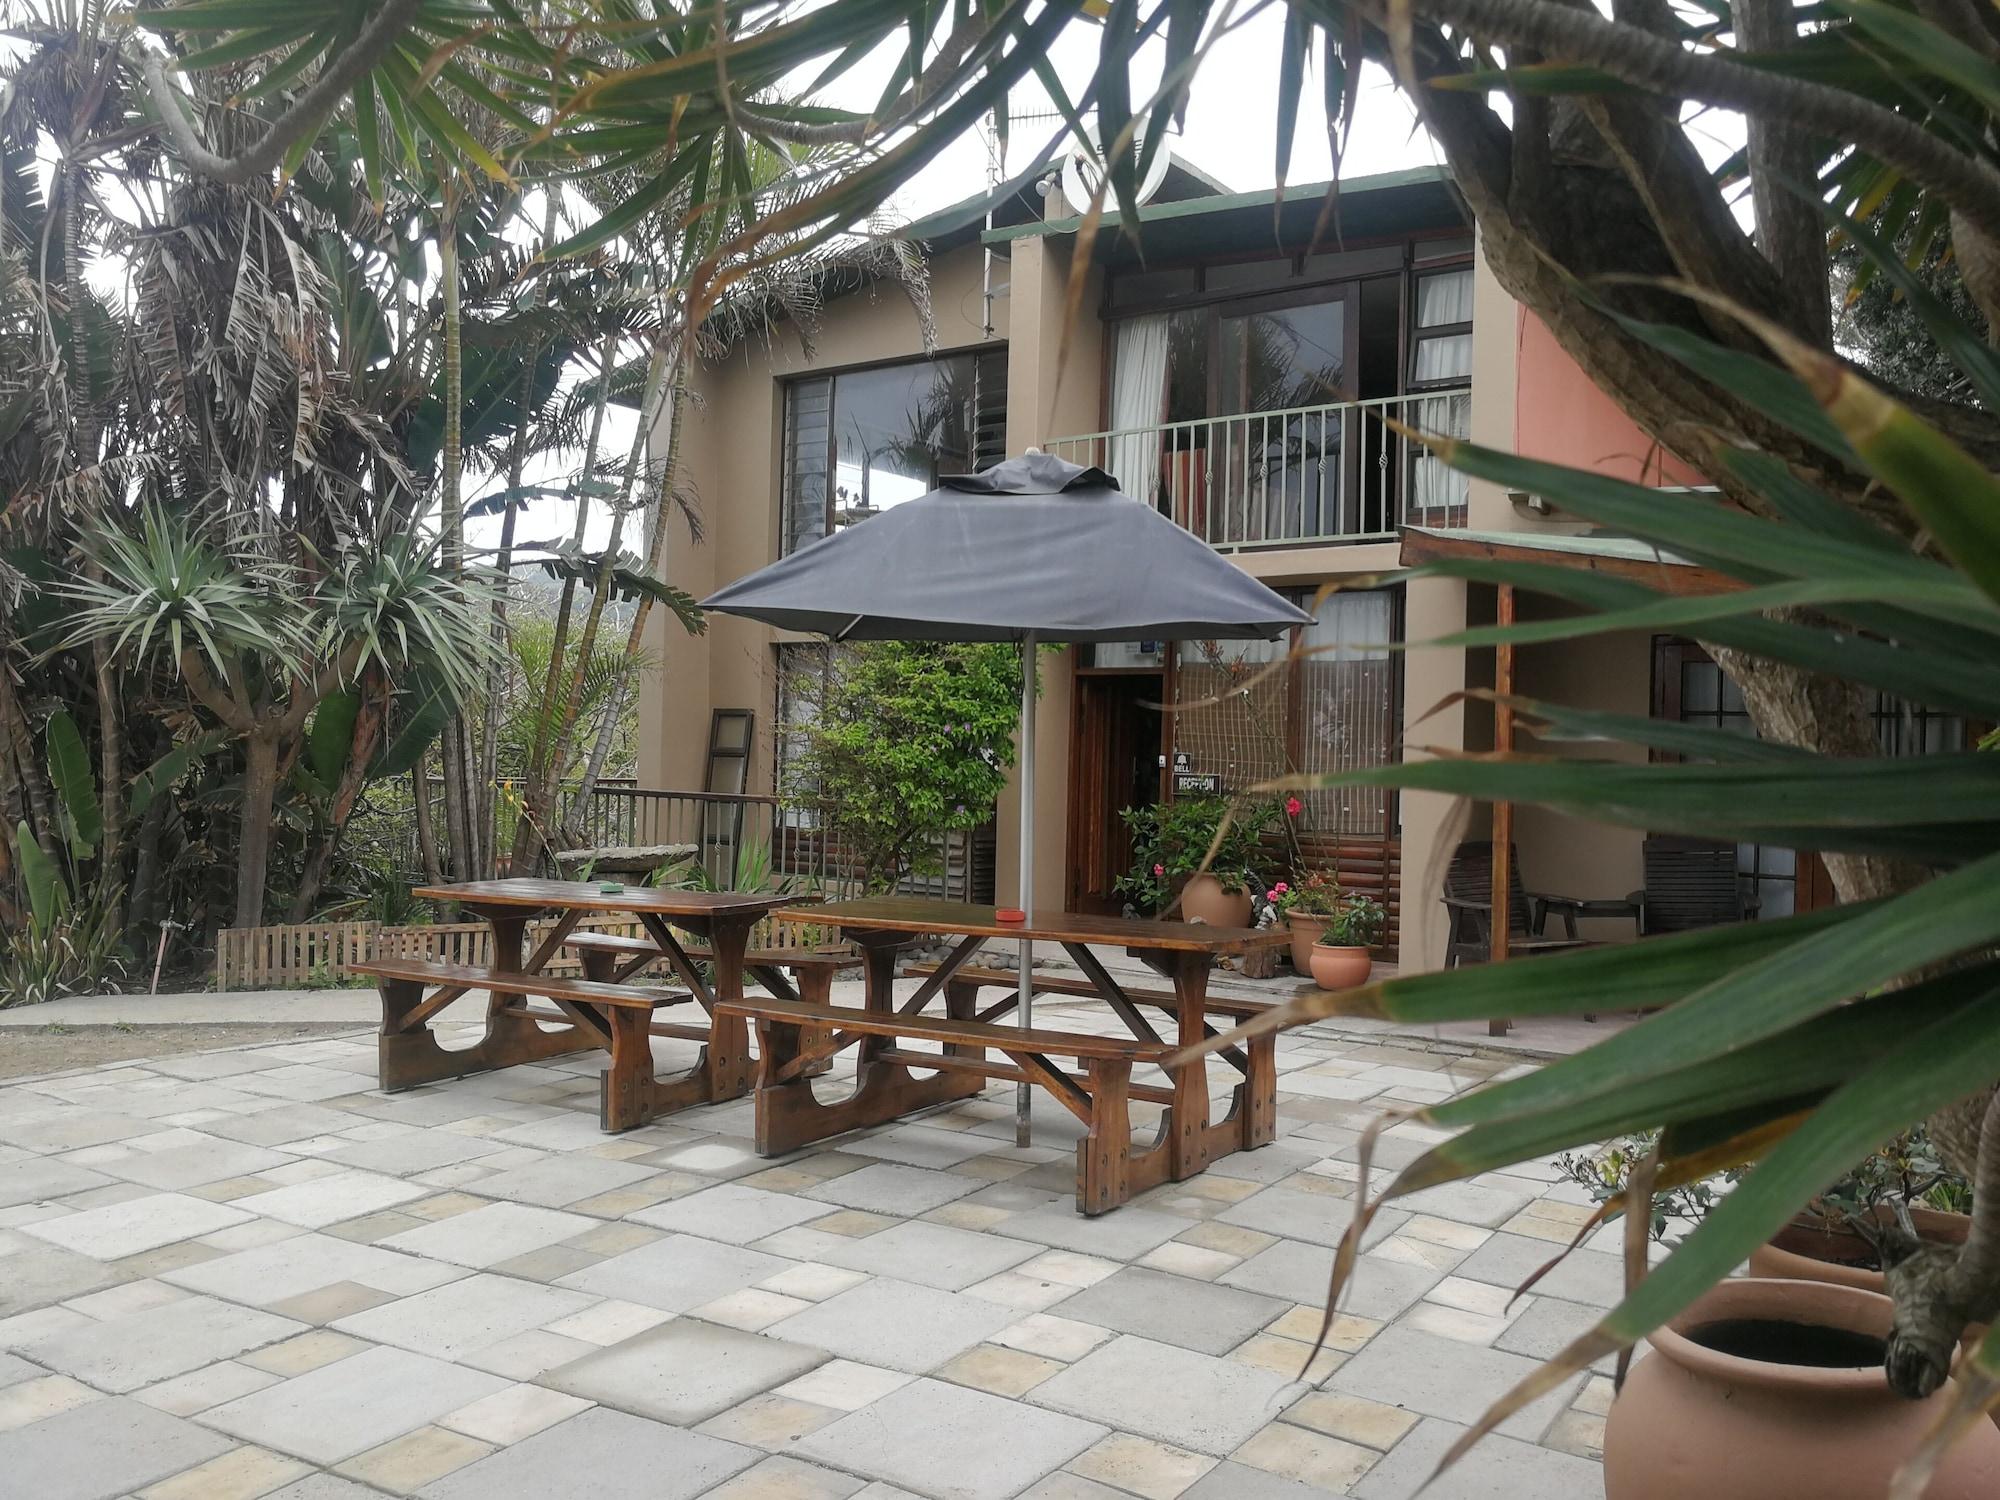 Umzimvubu Retreat Guest House, O.R.Tambo